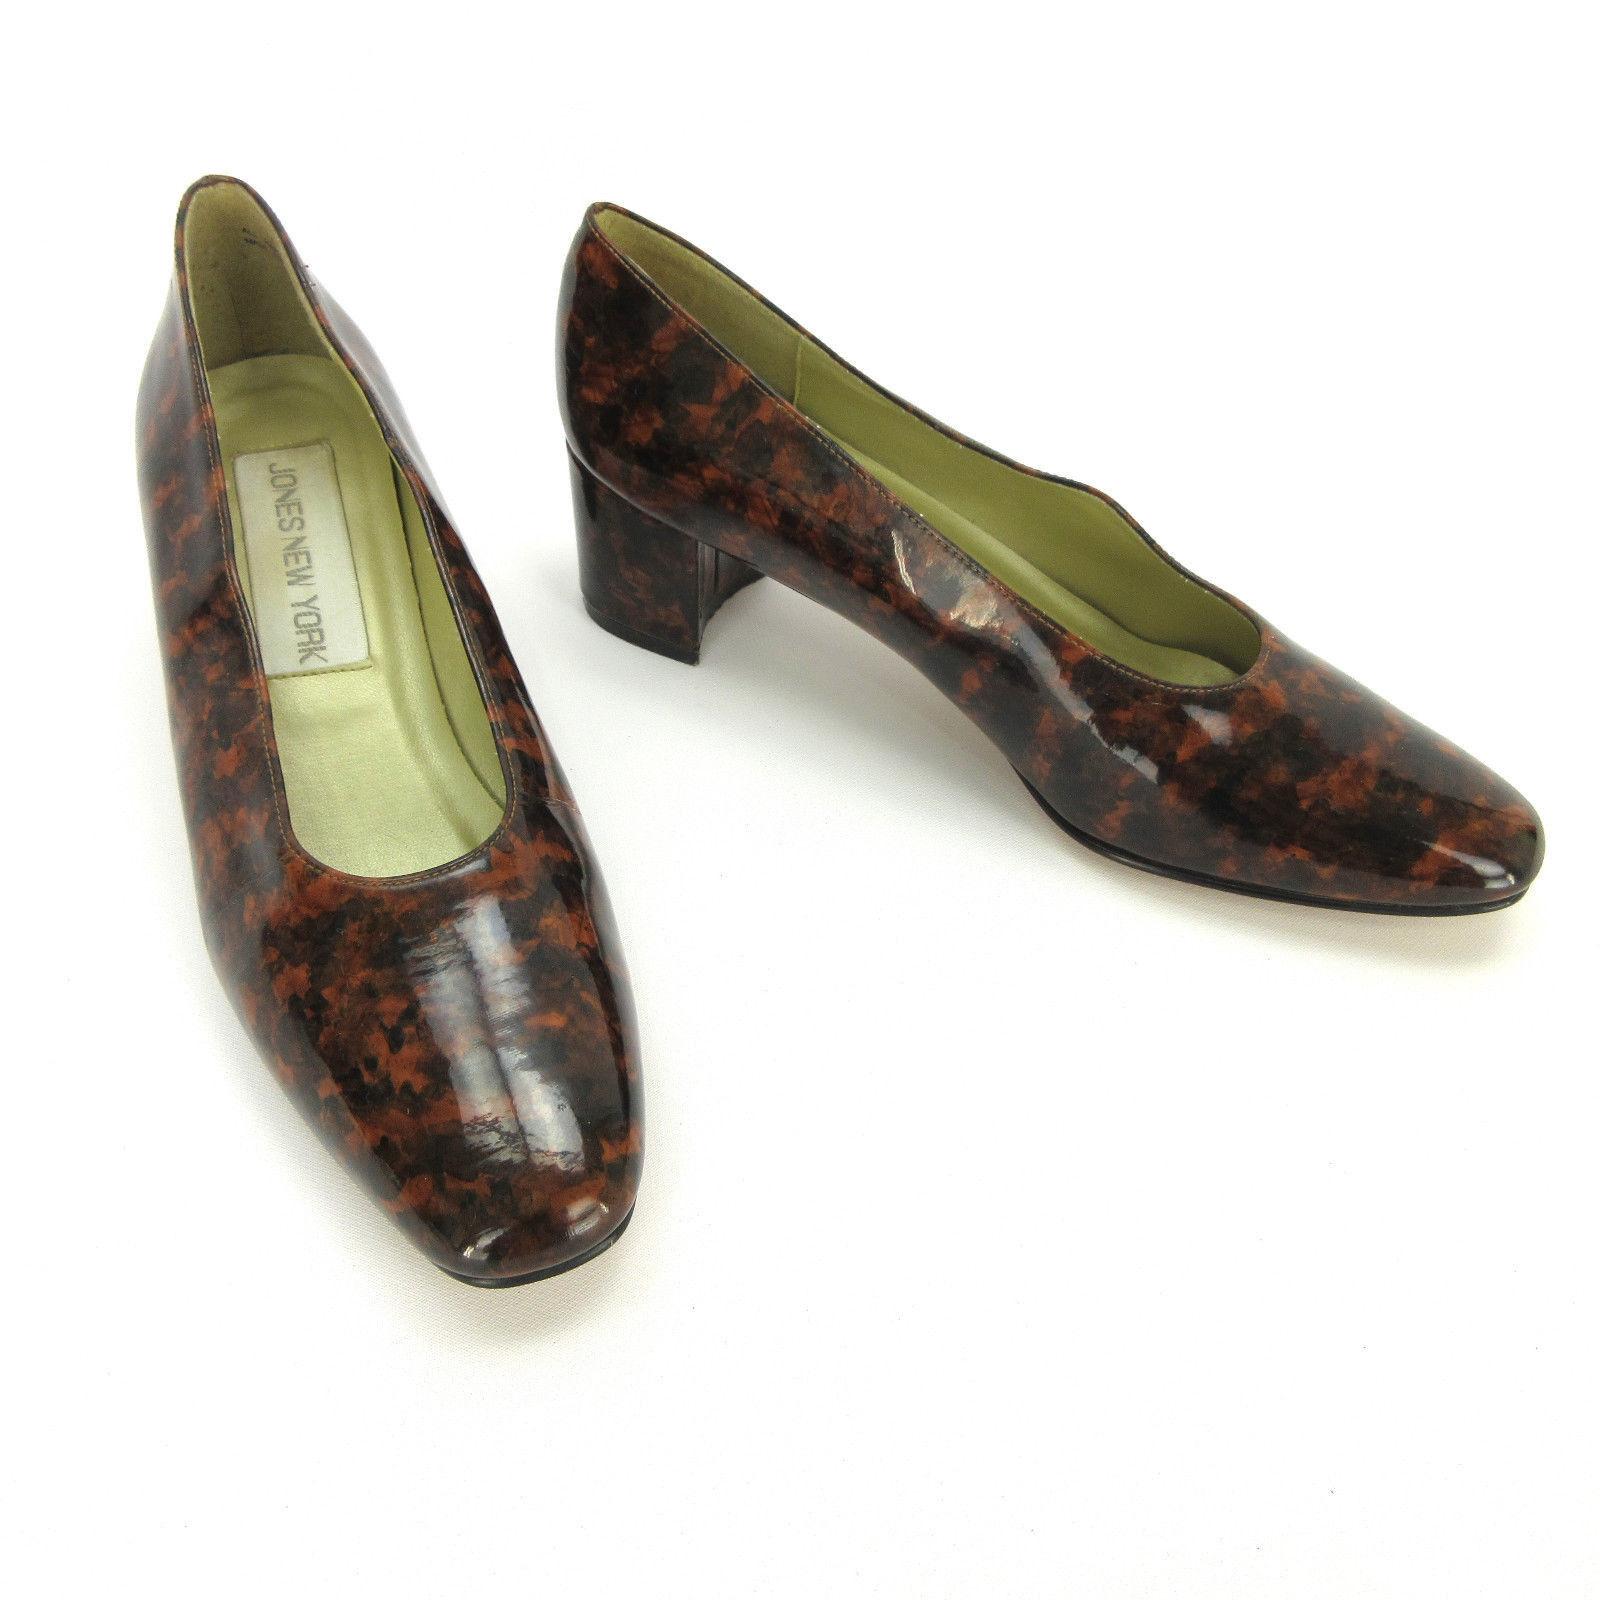 Jones New York Womens Heels 9 M M 9 Brown Tortoise Patent Square Toe Pumps Slip Ons 7e92b7